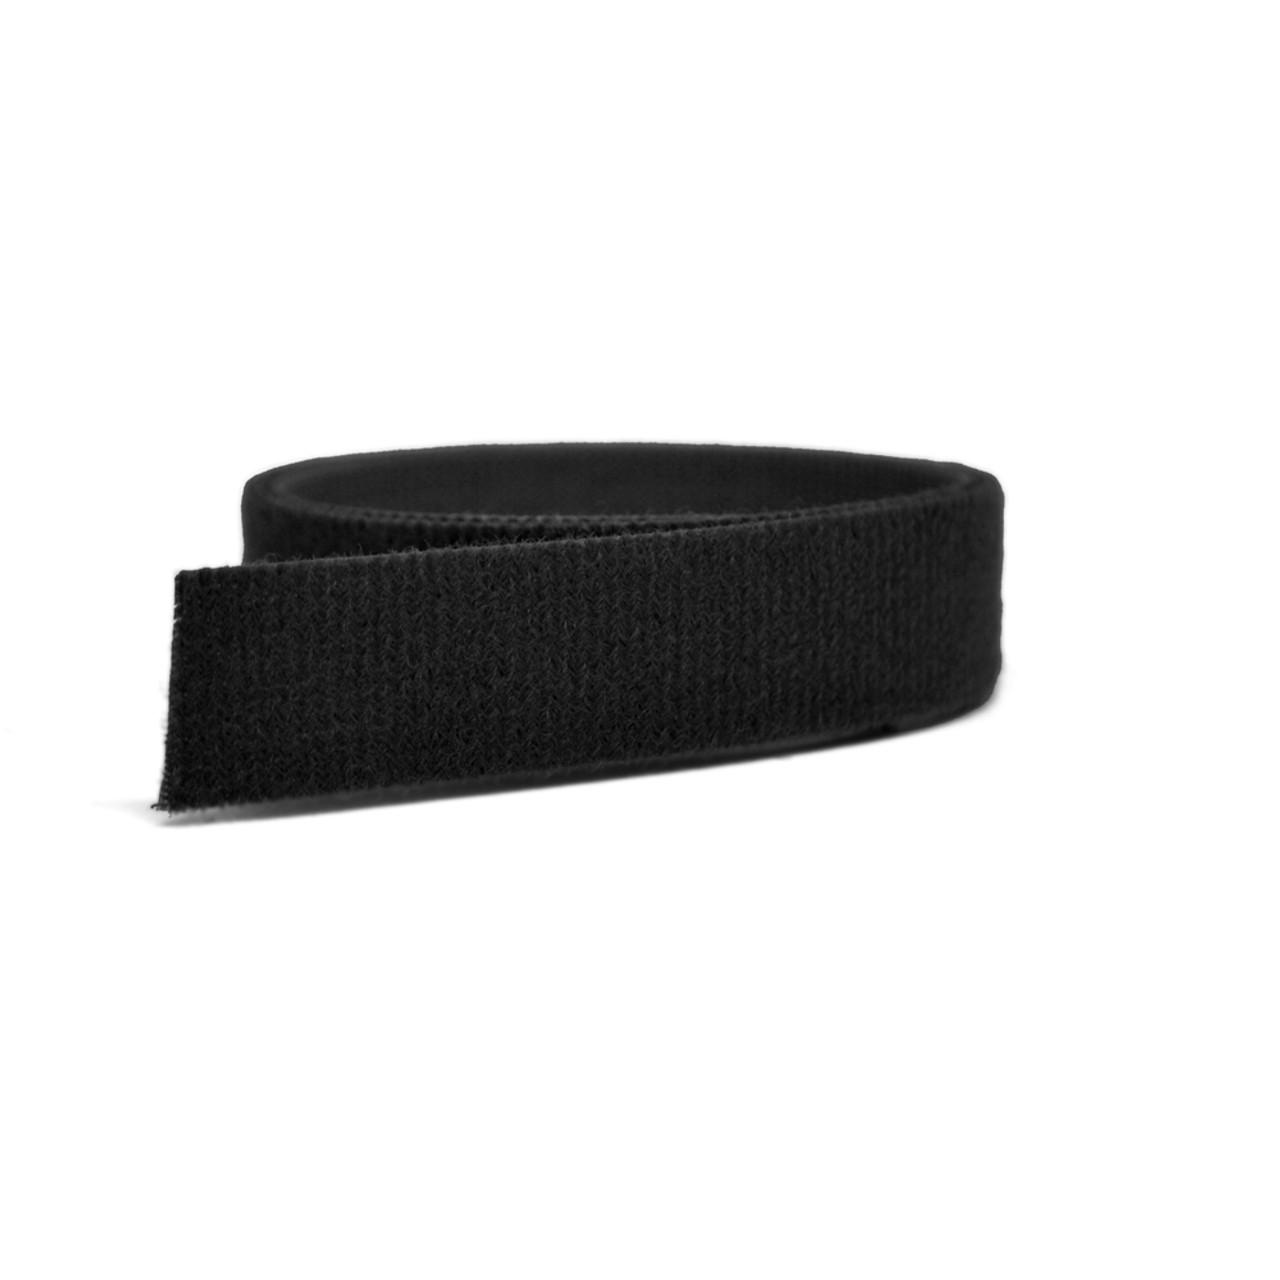 VELCRO® Brand ONE-WRAP® Tape Black Mini Rolls